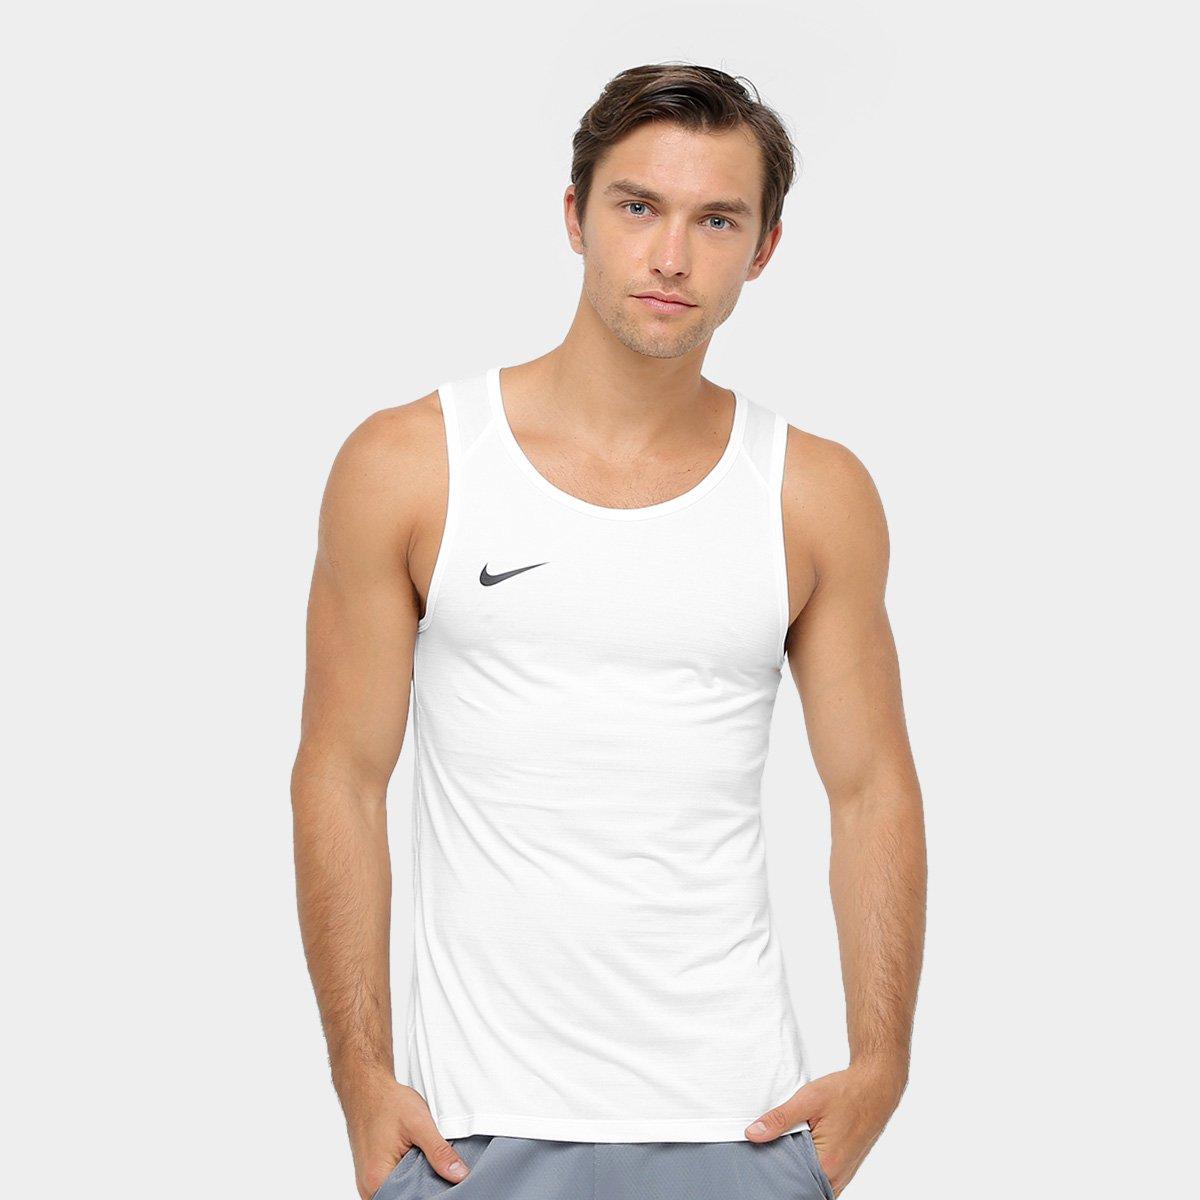 163ac73b37eb4 Camiseta Regata Nike SL Crossover - Branco - Compre Agora